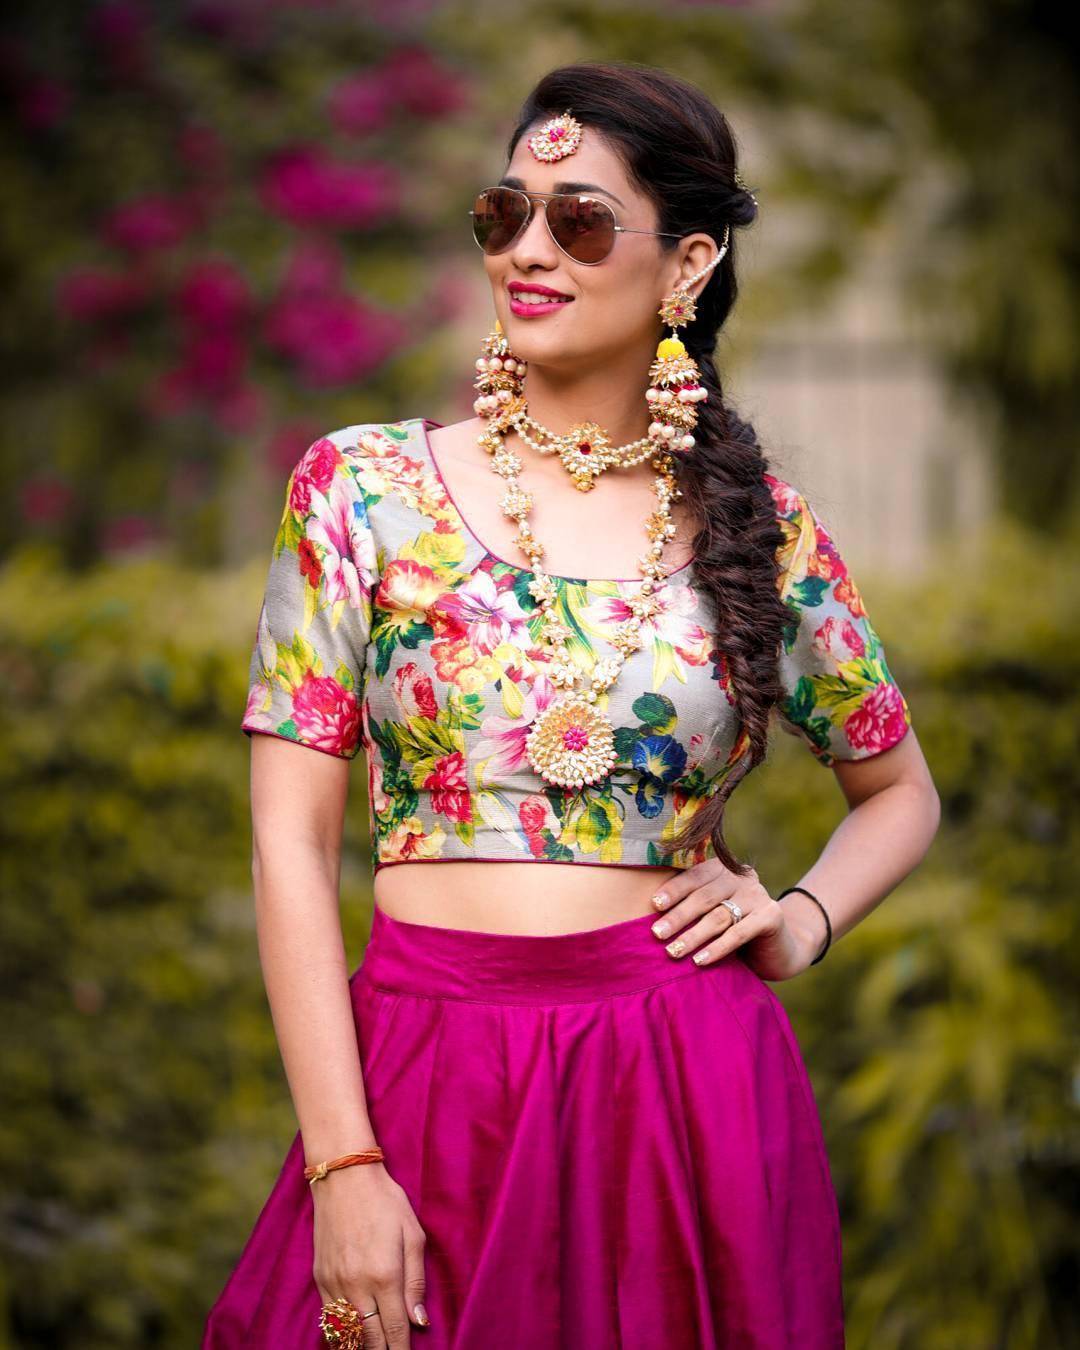 Bride, Mehendi outfit, Indian Bride